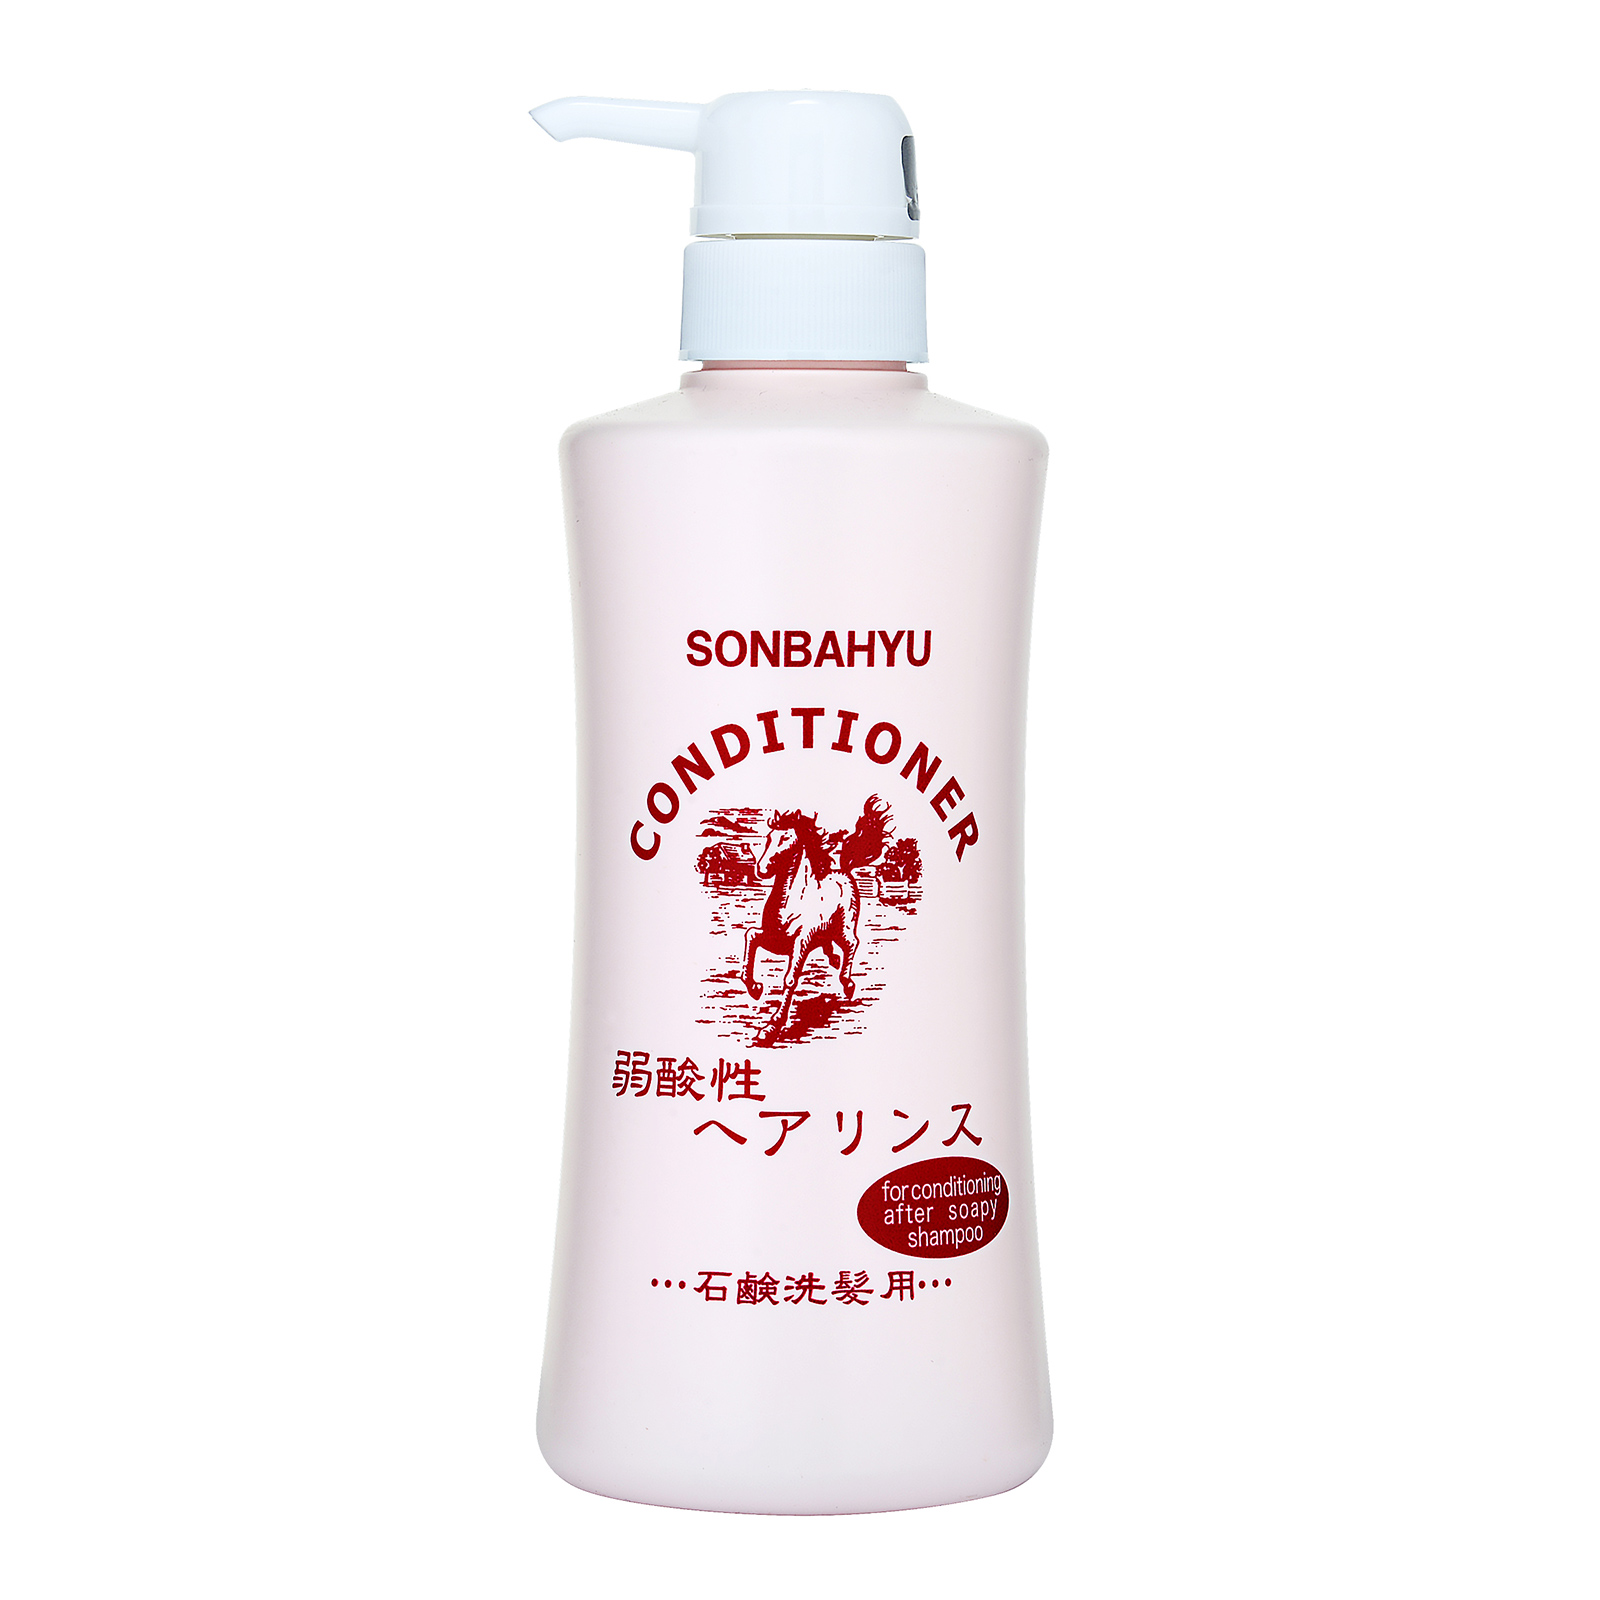 Yakushido Son Bahyu Mild Acid Conditioner 400ml,